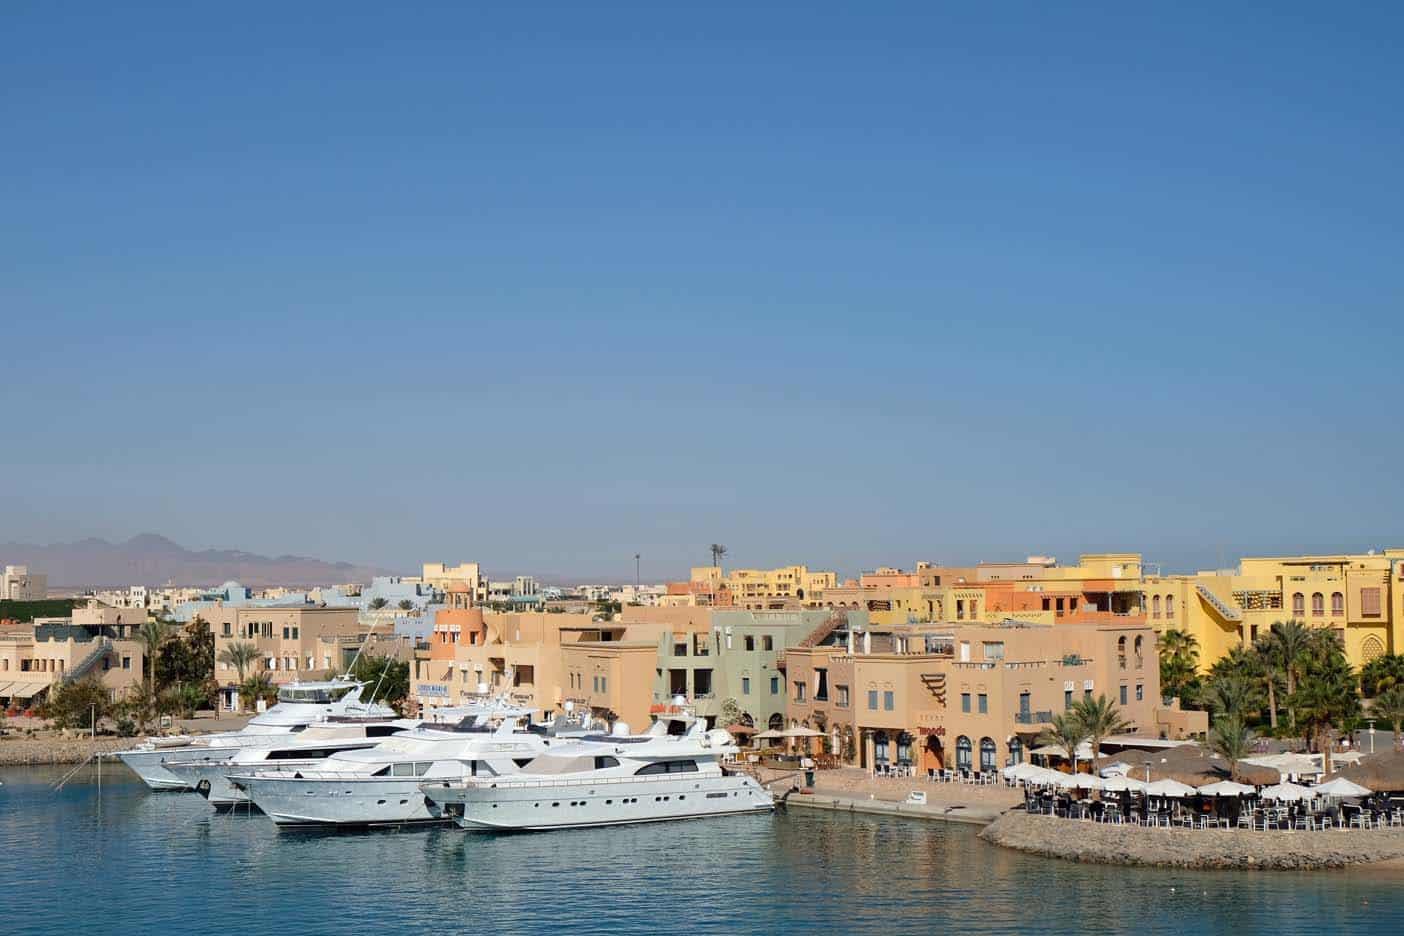 El gouna harbour